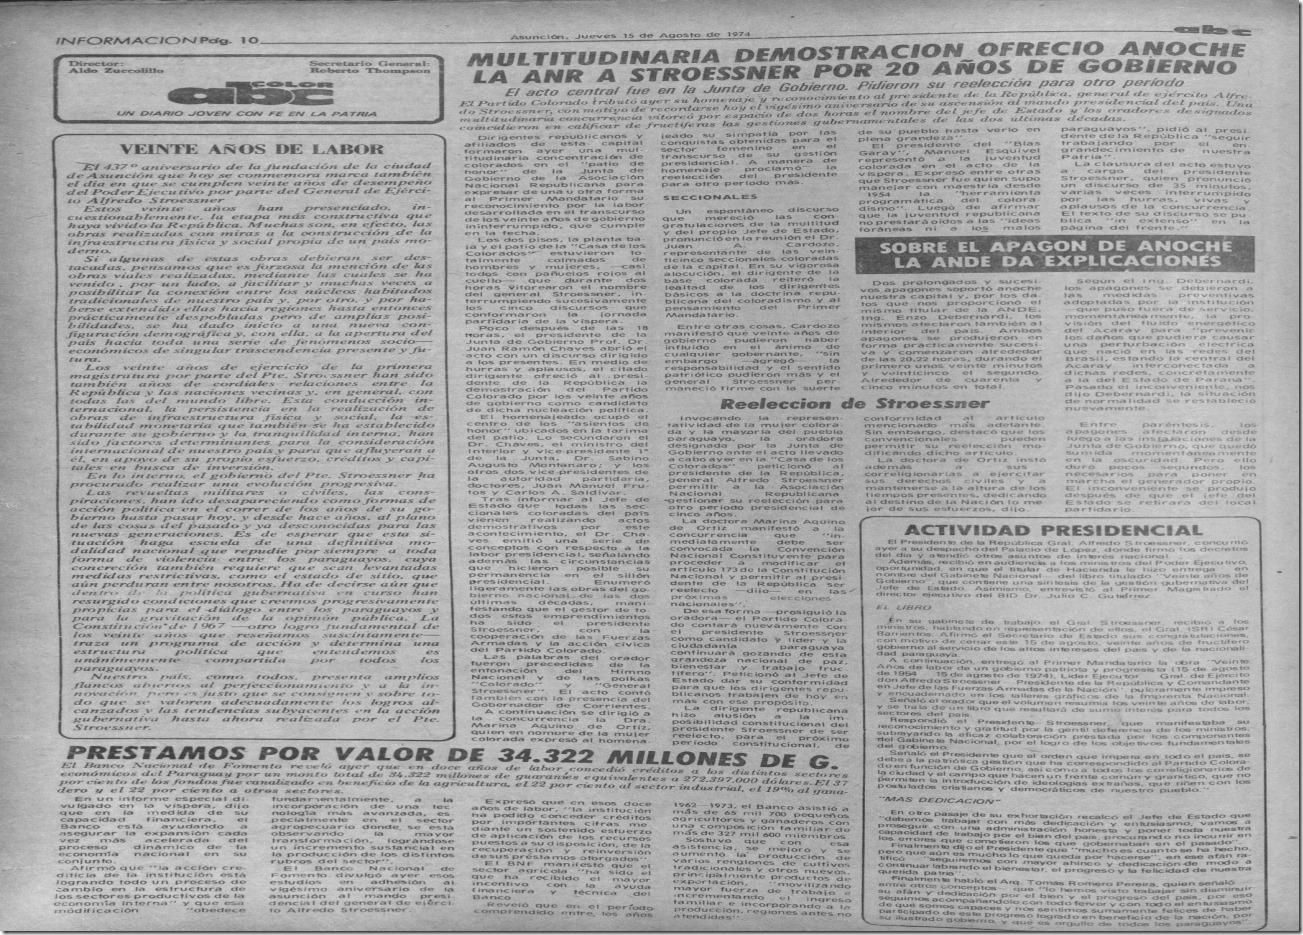 abc pag 10 y11 15 ag 1974-1-1